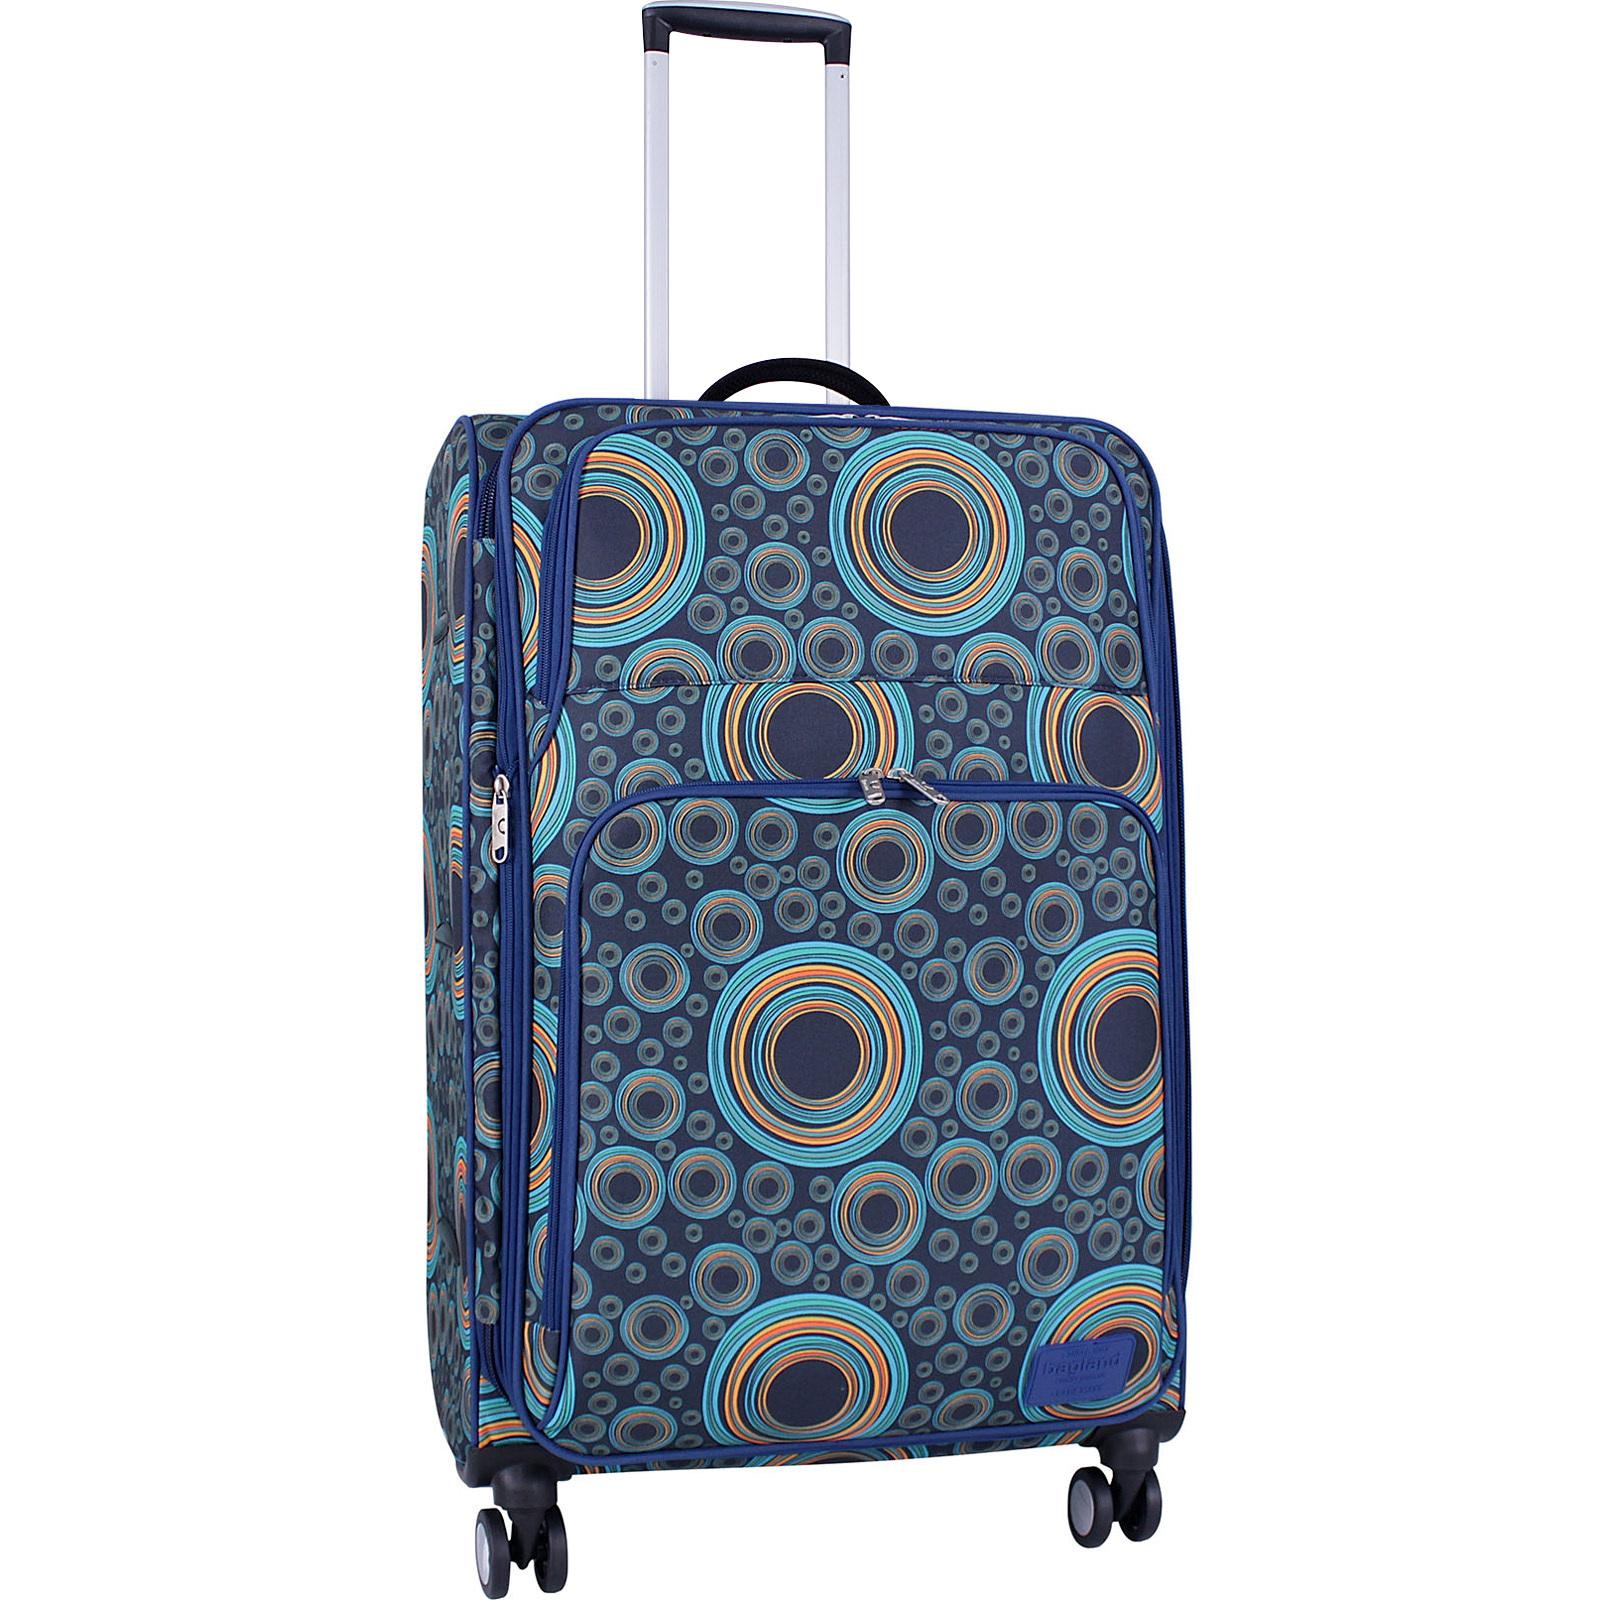 Дорожные чемоданы Чемодан Bagland Валенсия большой дизайн 83 л. сублімація 654 (0037966274) IMG_4998_суб.654_.JPG